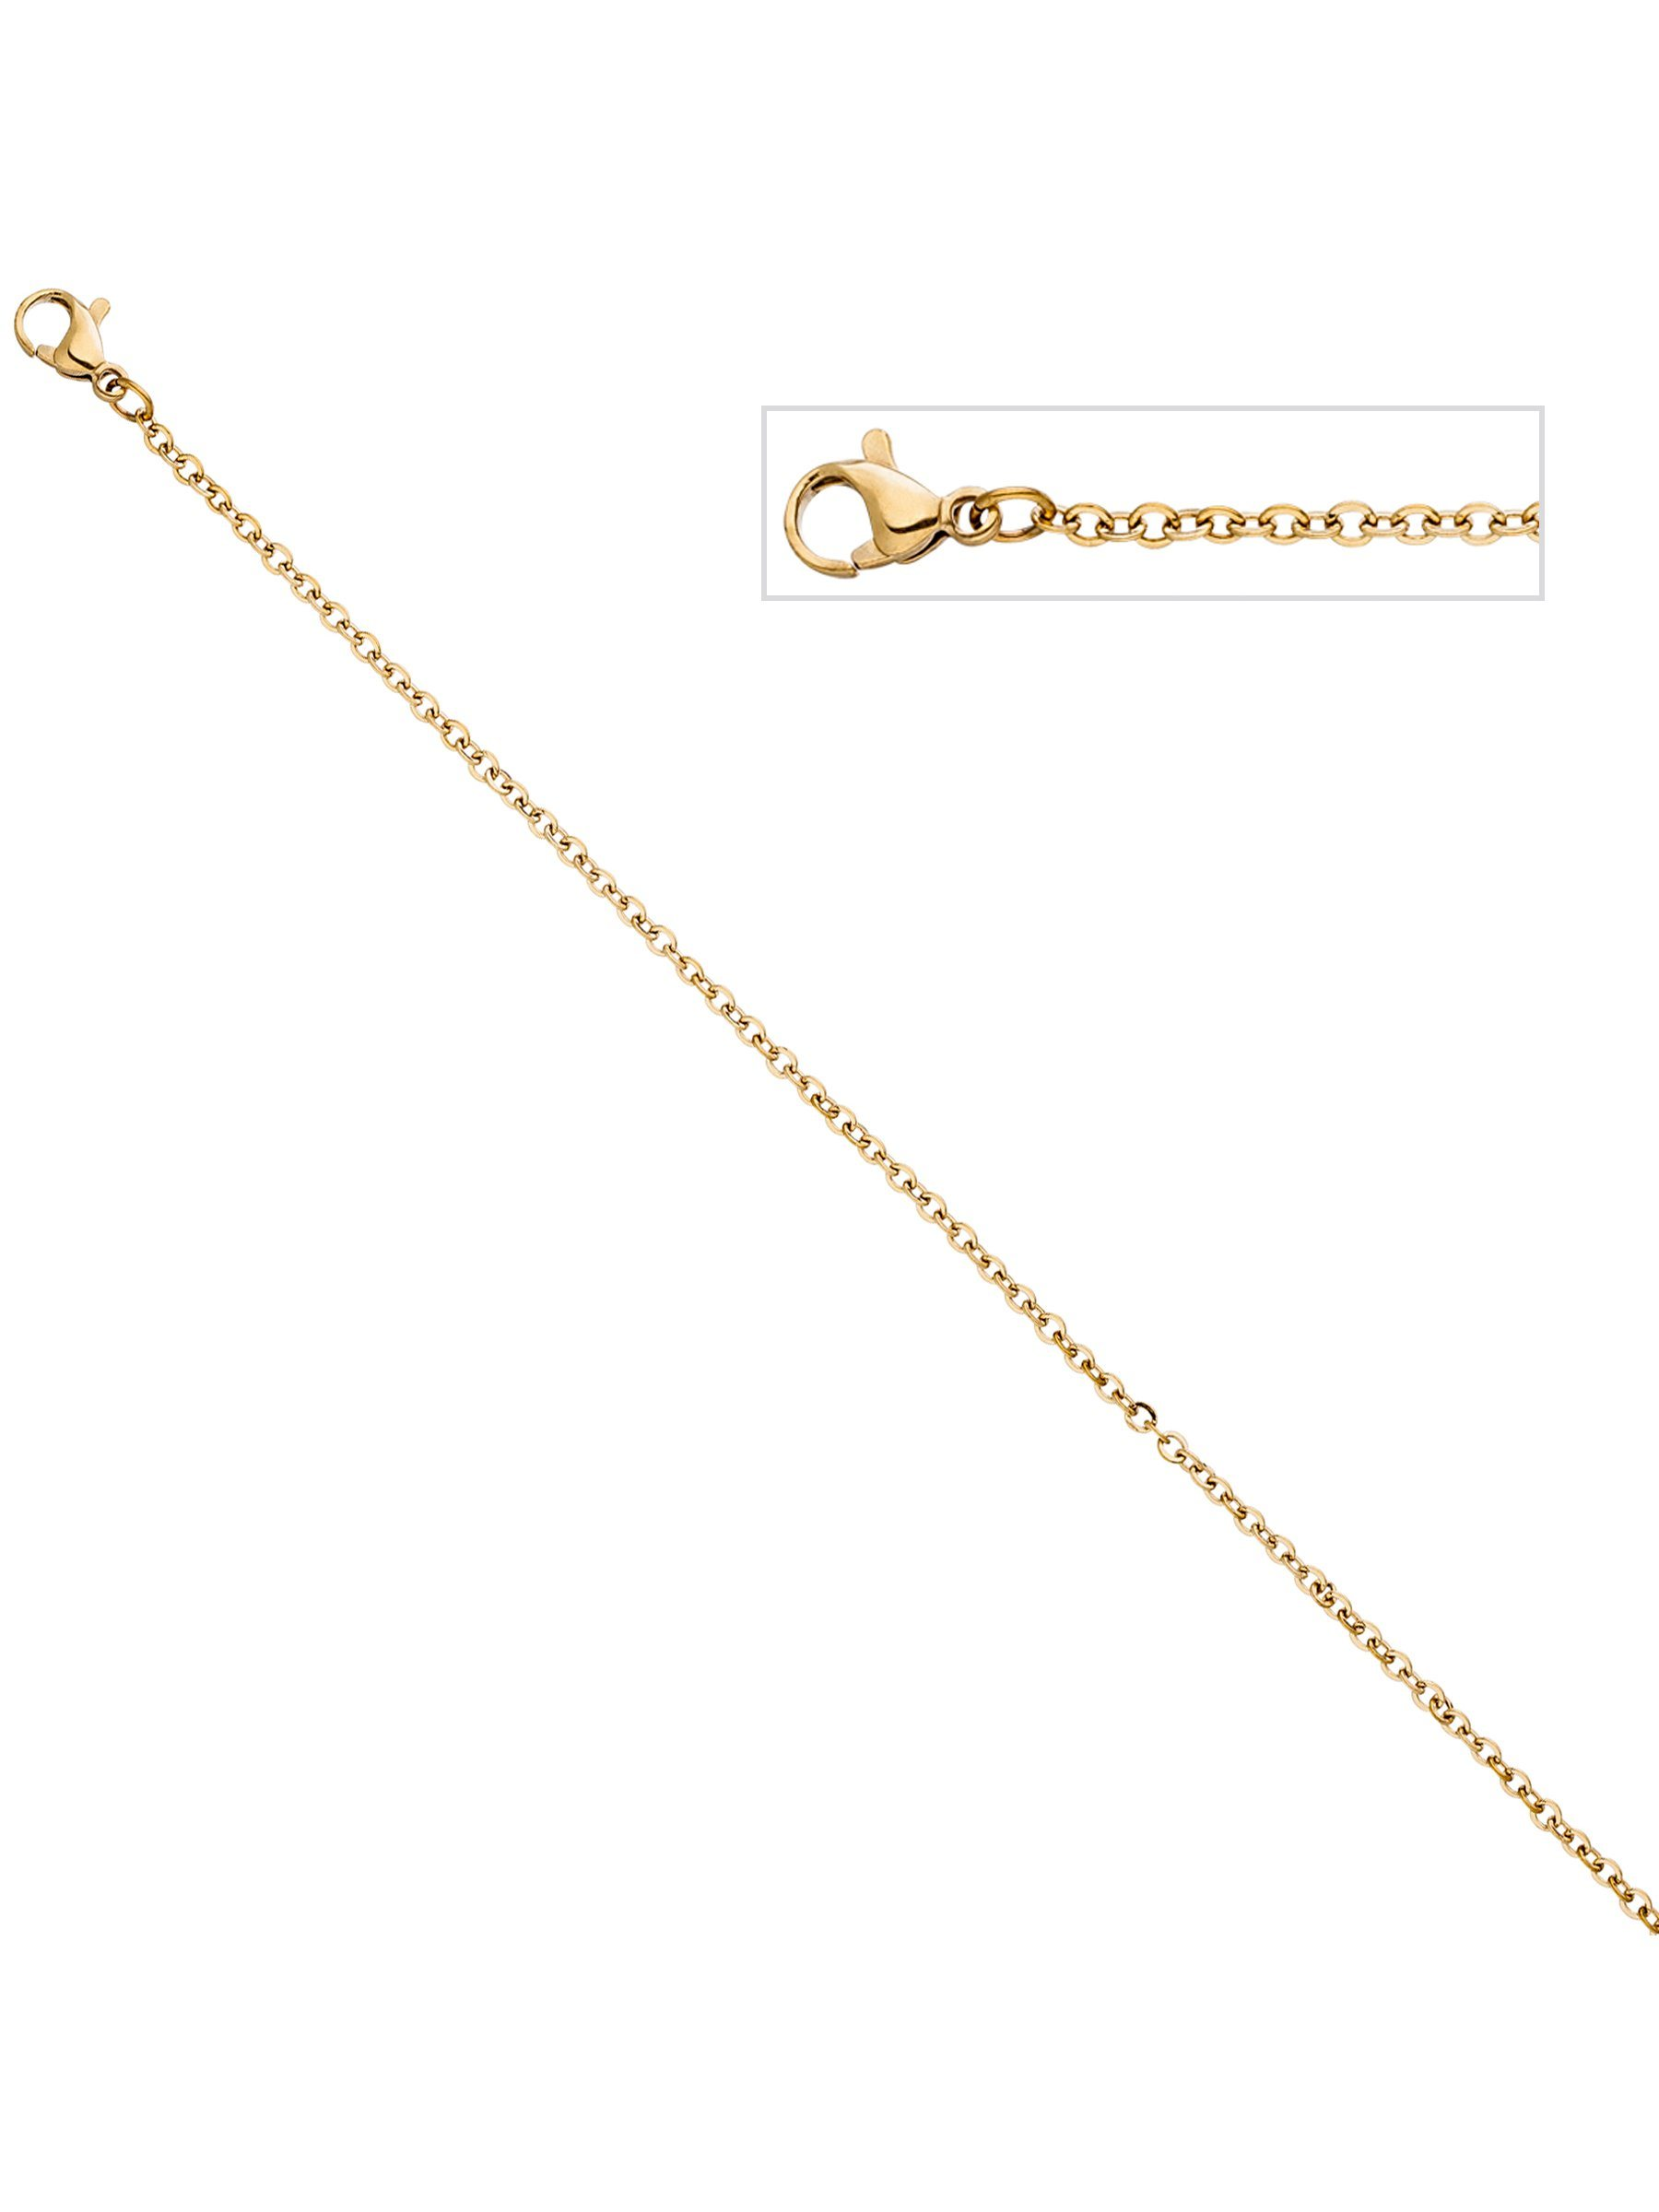 Adelia´s Kette ohne Anhänger Edelstahl L - 47 cm | Schmuck > Halsketten > Ketten ohne Anhänger | Goldfarben | Adelia´s